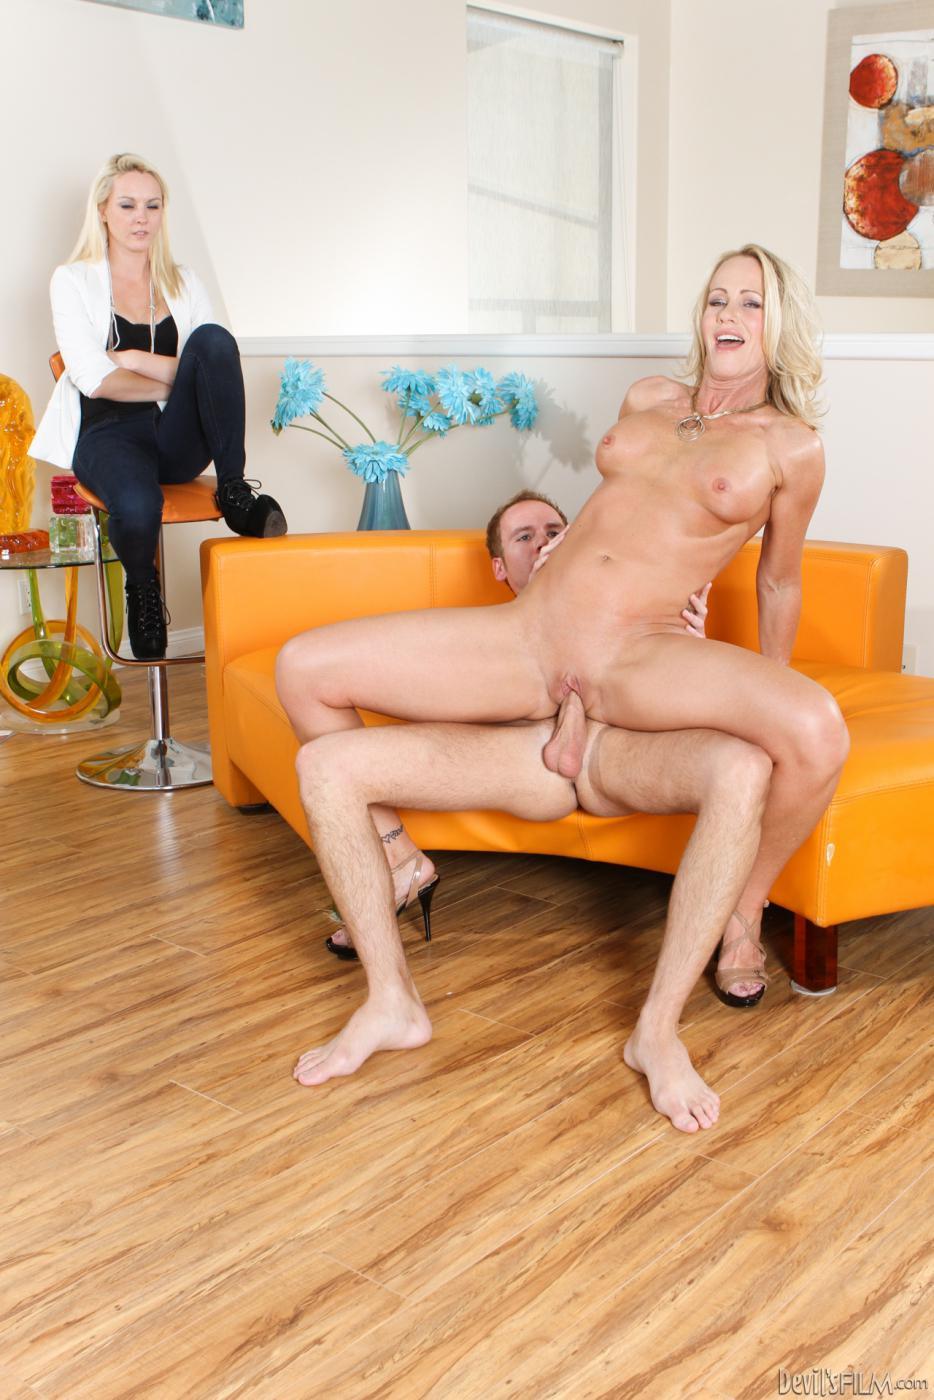 Ashley Stone яростно насаживается на член, а ее развратная подруга Simone Sonay наблюдает